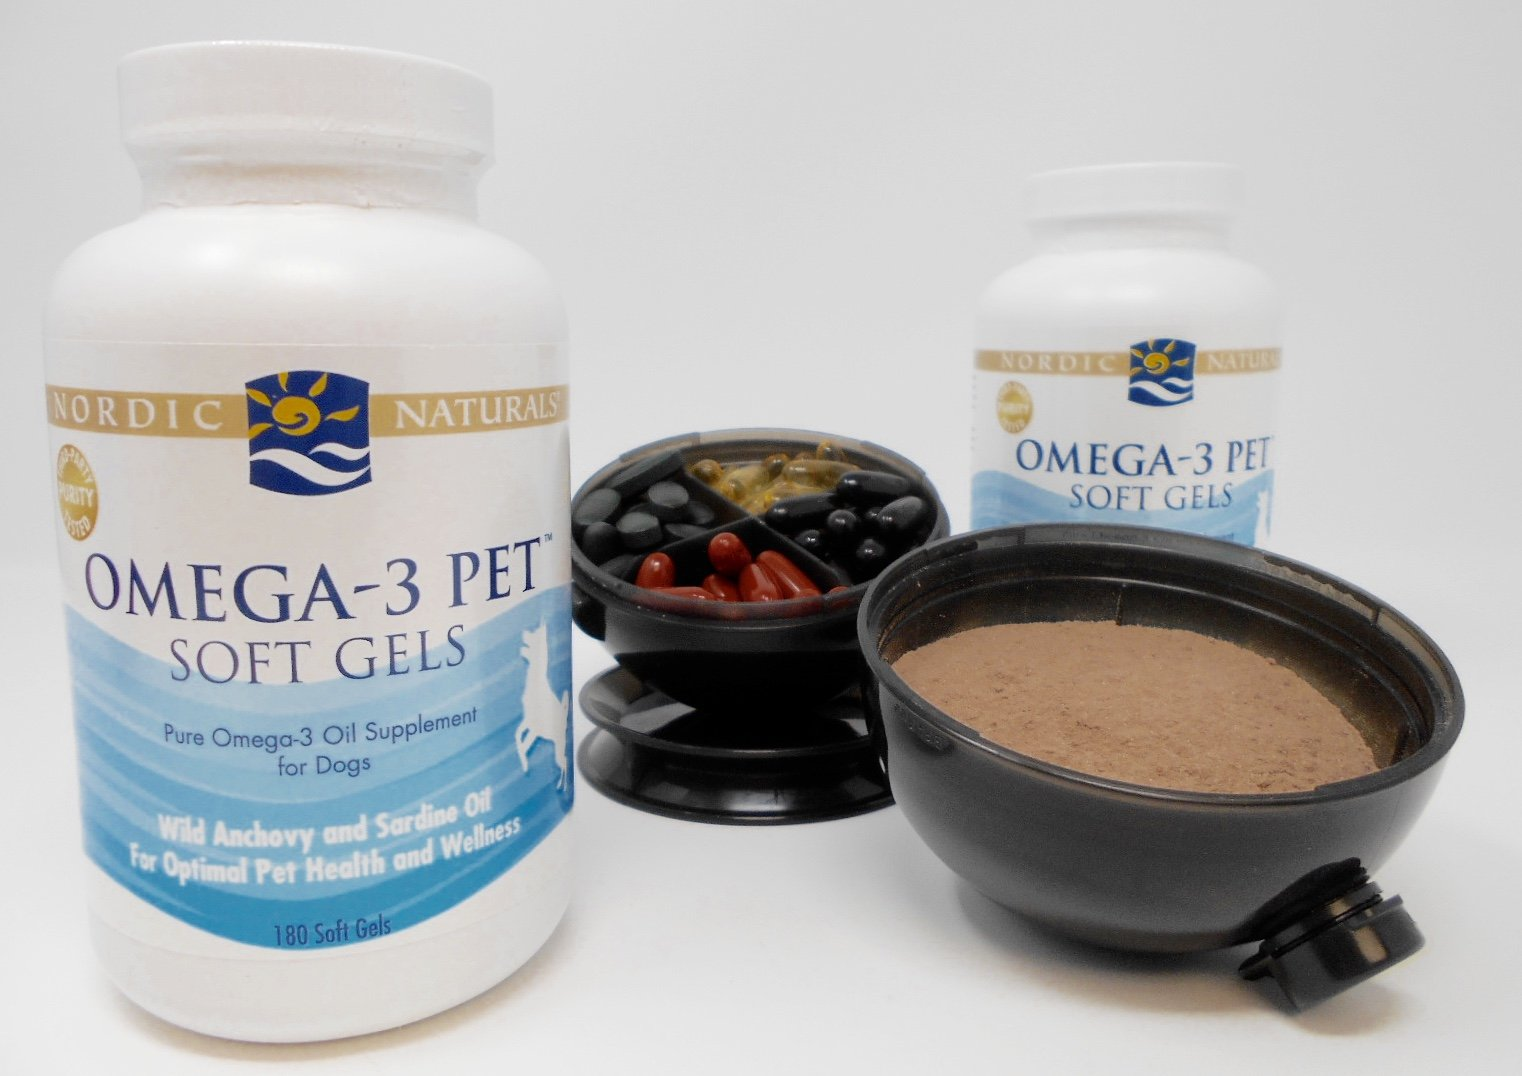 Nordic Naturals - Omega-3 PET, Promotes Optimal Pet Health and Wellness, 180 Soft Gels (2-Pack) Viita Ball Bundle